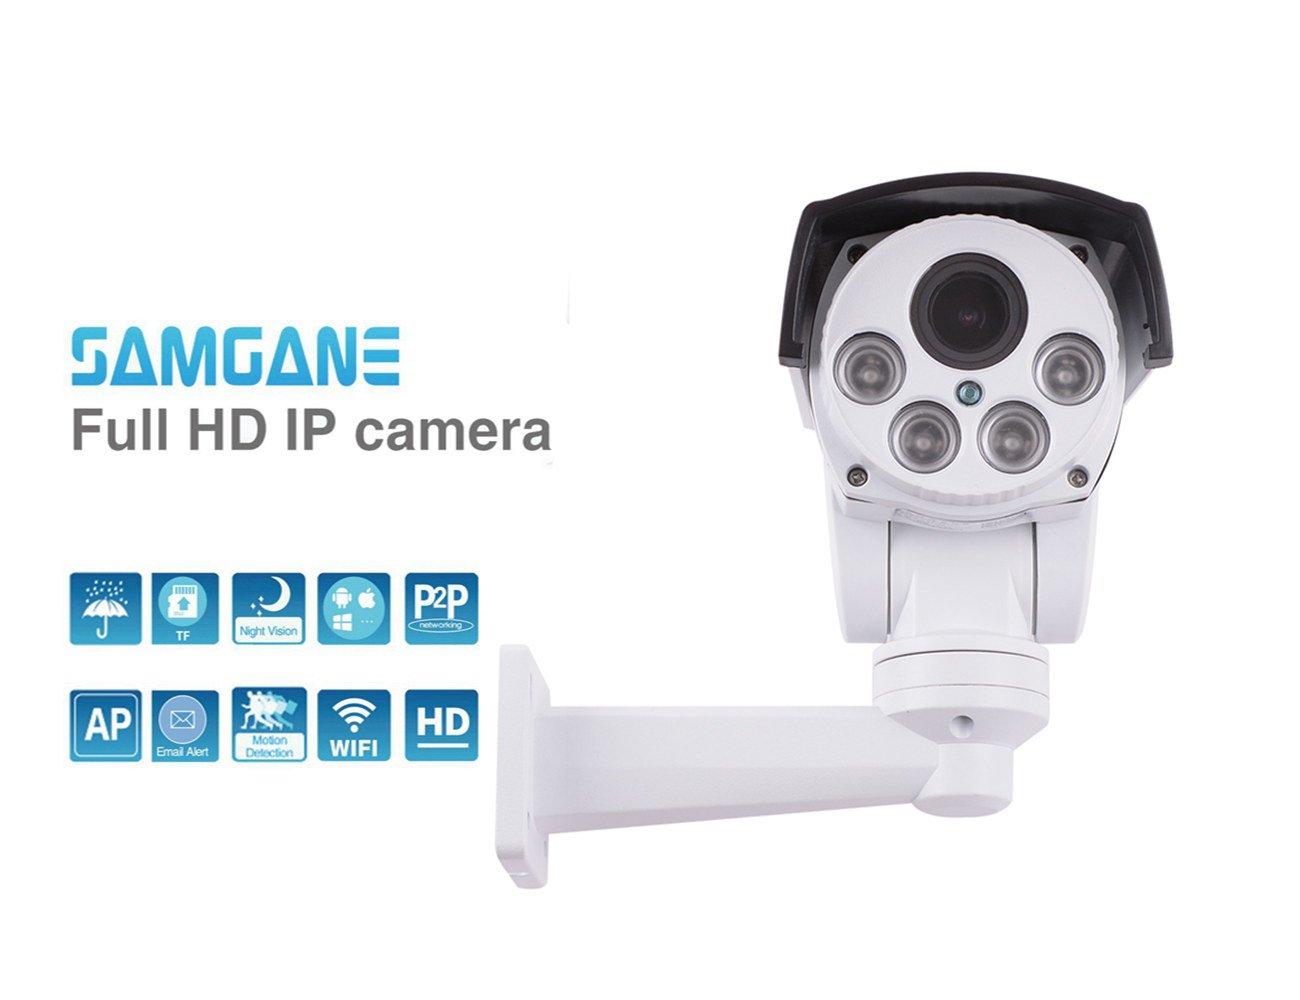 Samgane Security PTZ Camera HD 1080p Wireless wifi camera Outdoor Pan Tilt 4x Optical Zoom Auto-focus Camera Night Vision camera IP66 Weatherproof No SD Card Pre-install SQ-87W White by Samgane